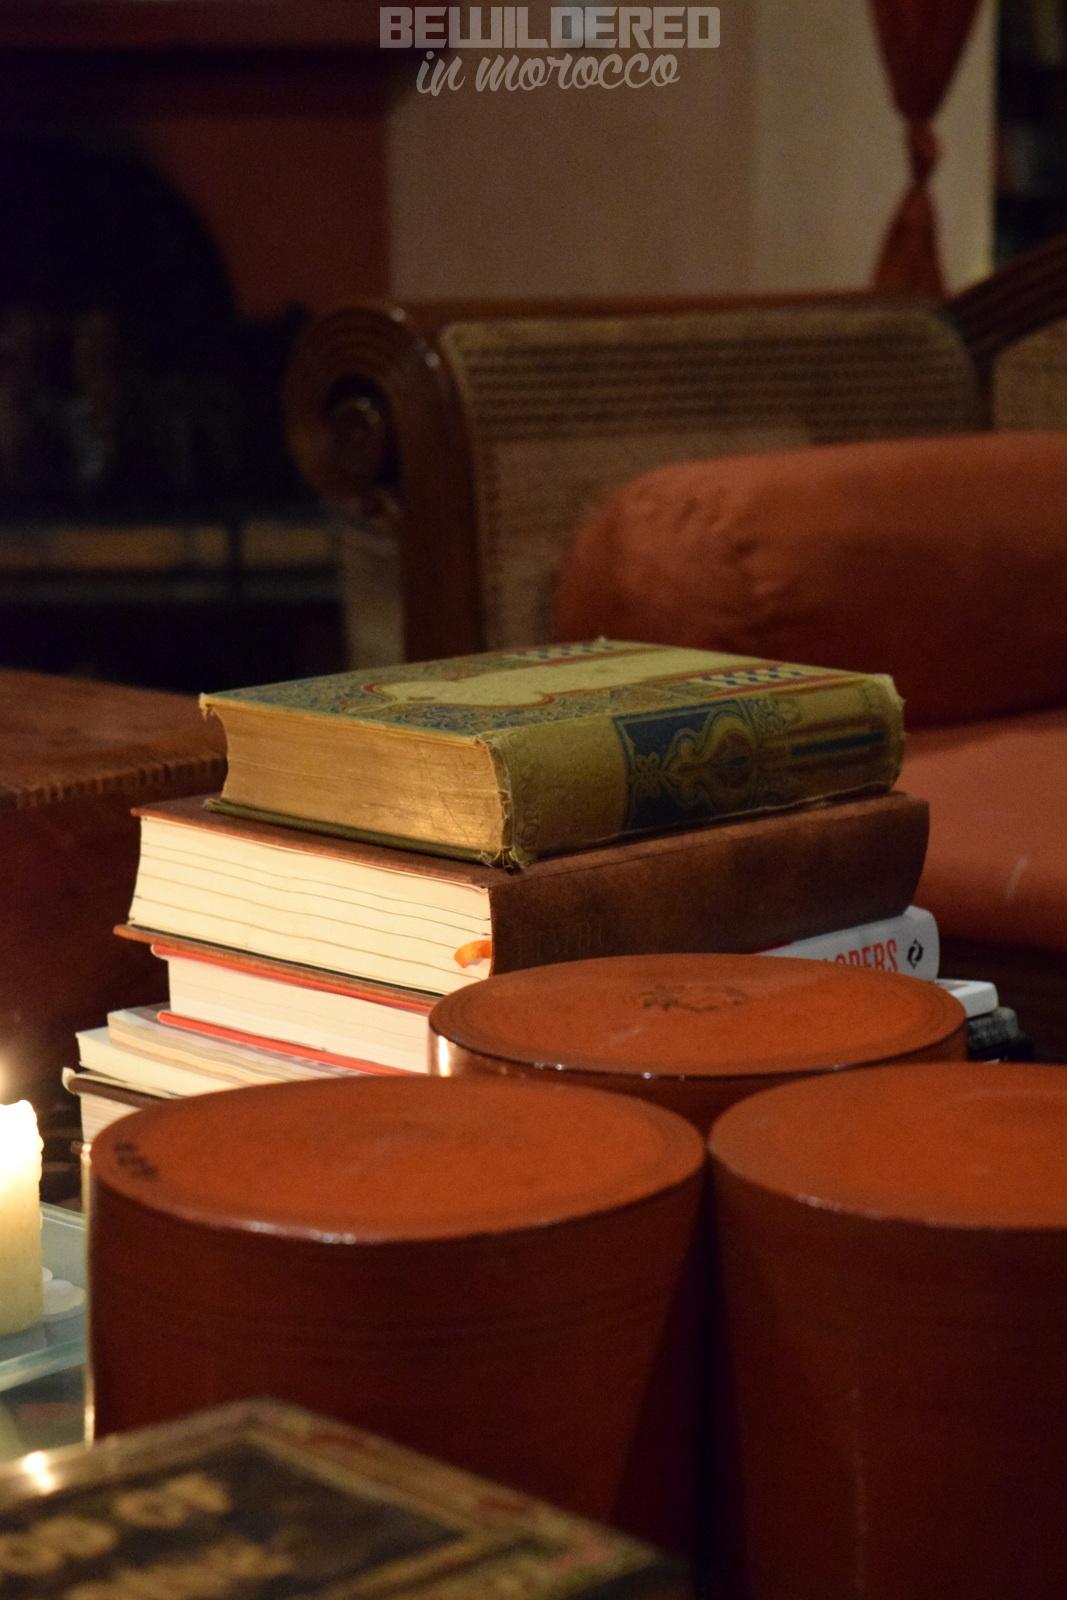 old book tahir idries shah novel stara ksiega ksiazka livre vielle library bookshop bookstore printing house drukarnia